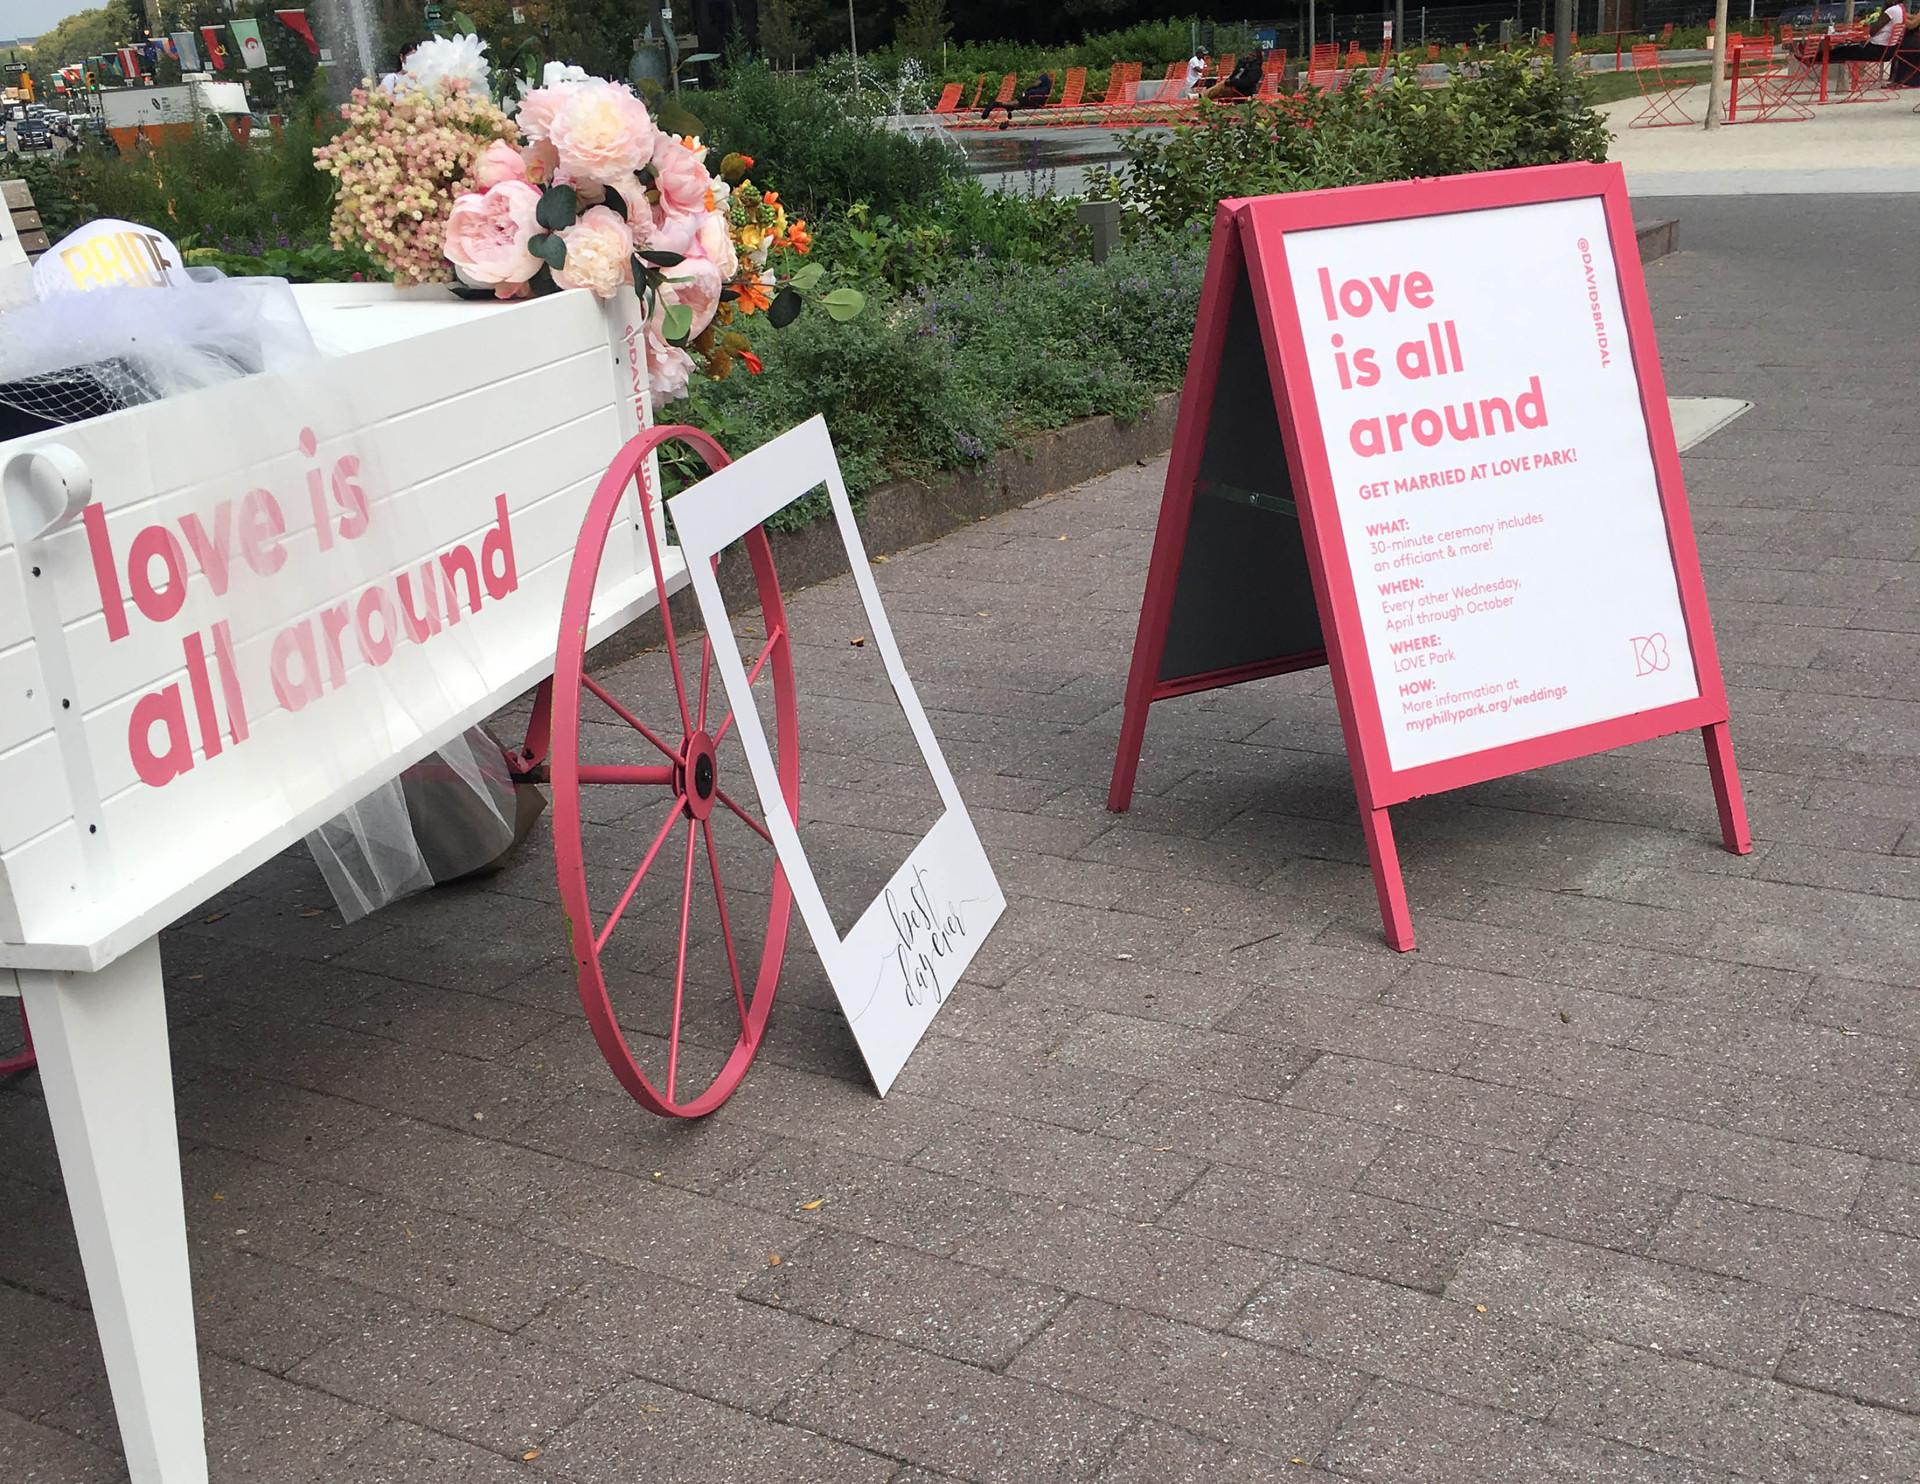 David's Bridal LOVE Park Pop-Up